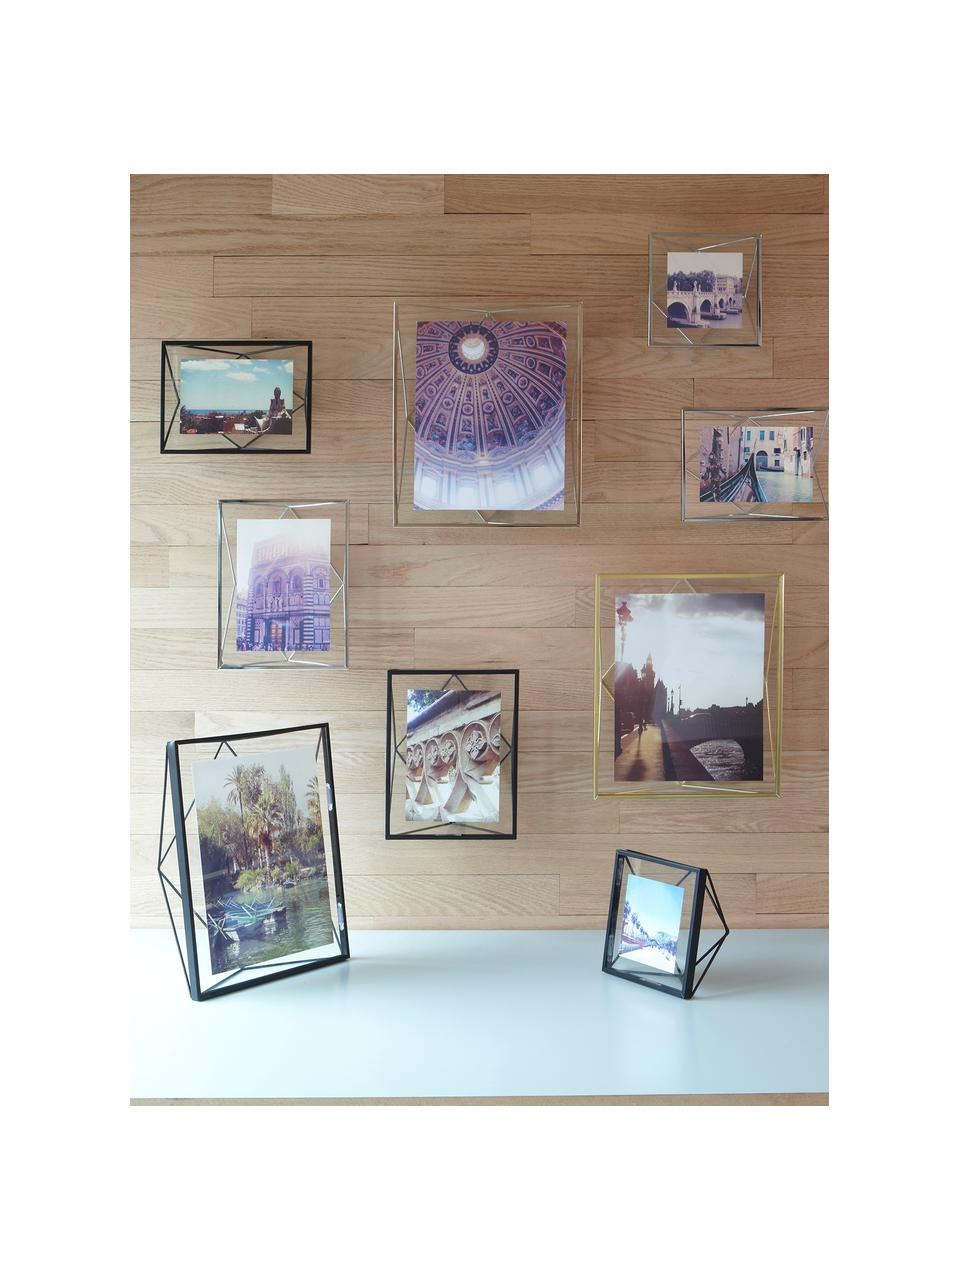 Bilderrahmen Prisma, Rahmen: Stahl, Front: Glas, Chromfarben, 10 x 15 cm